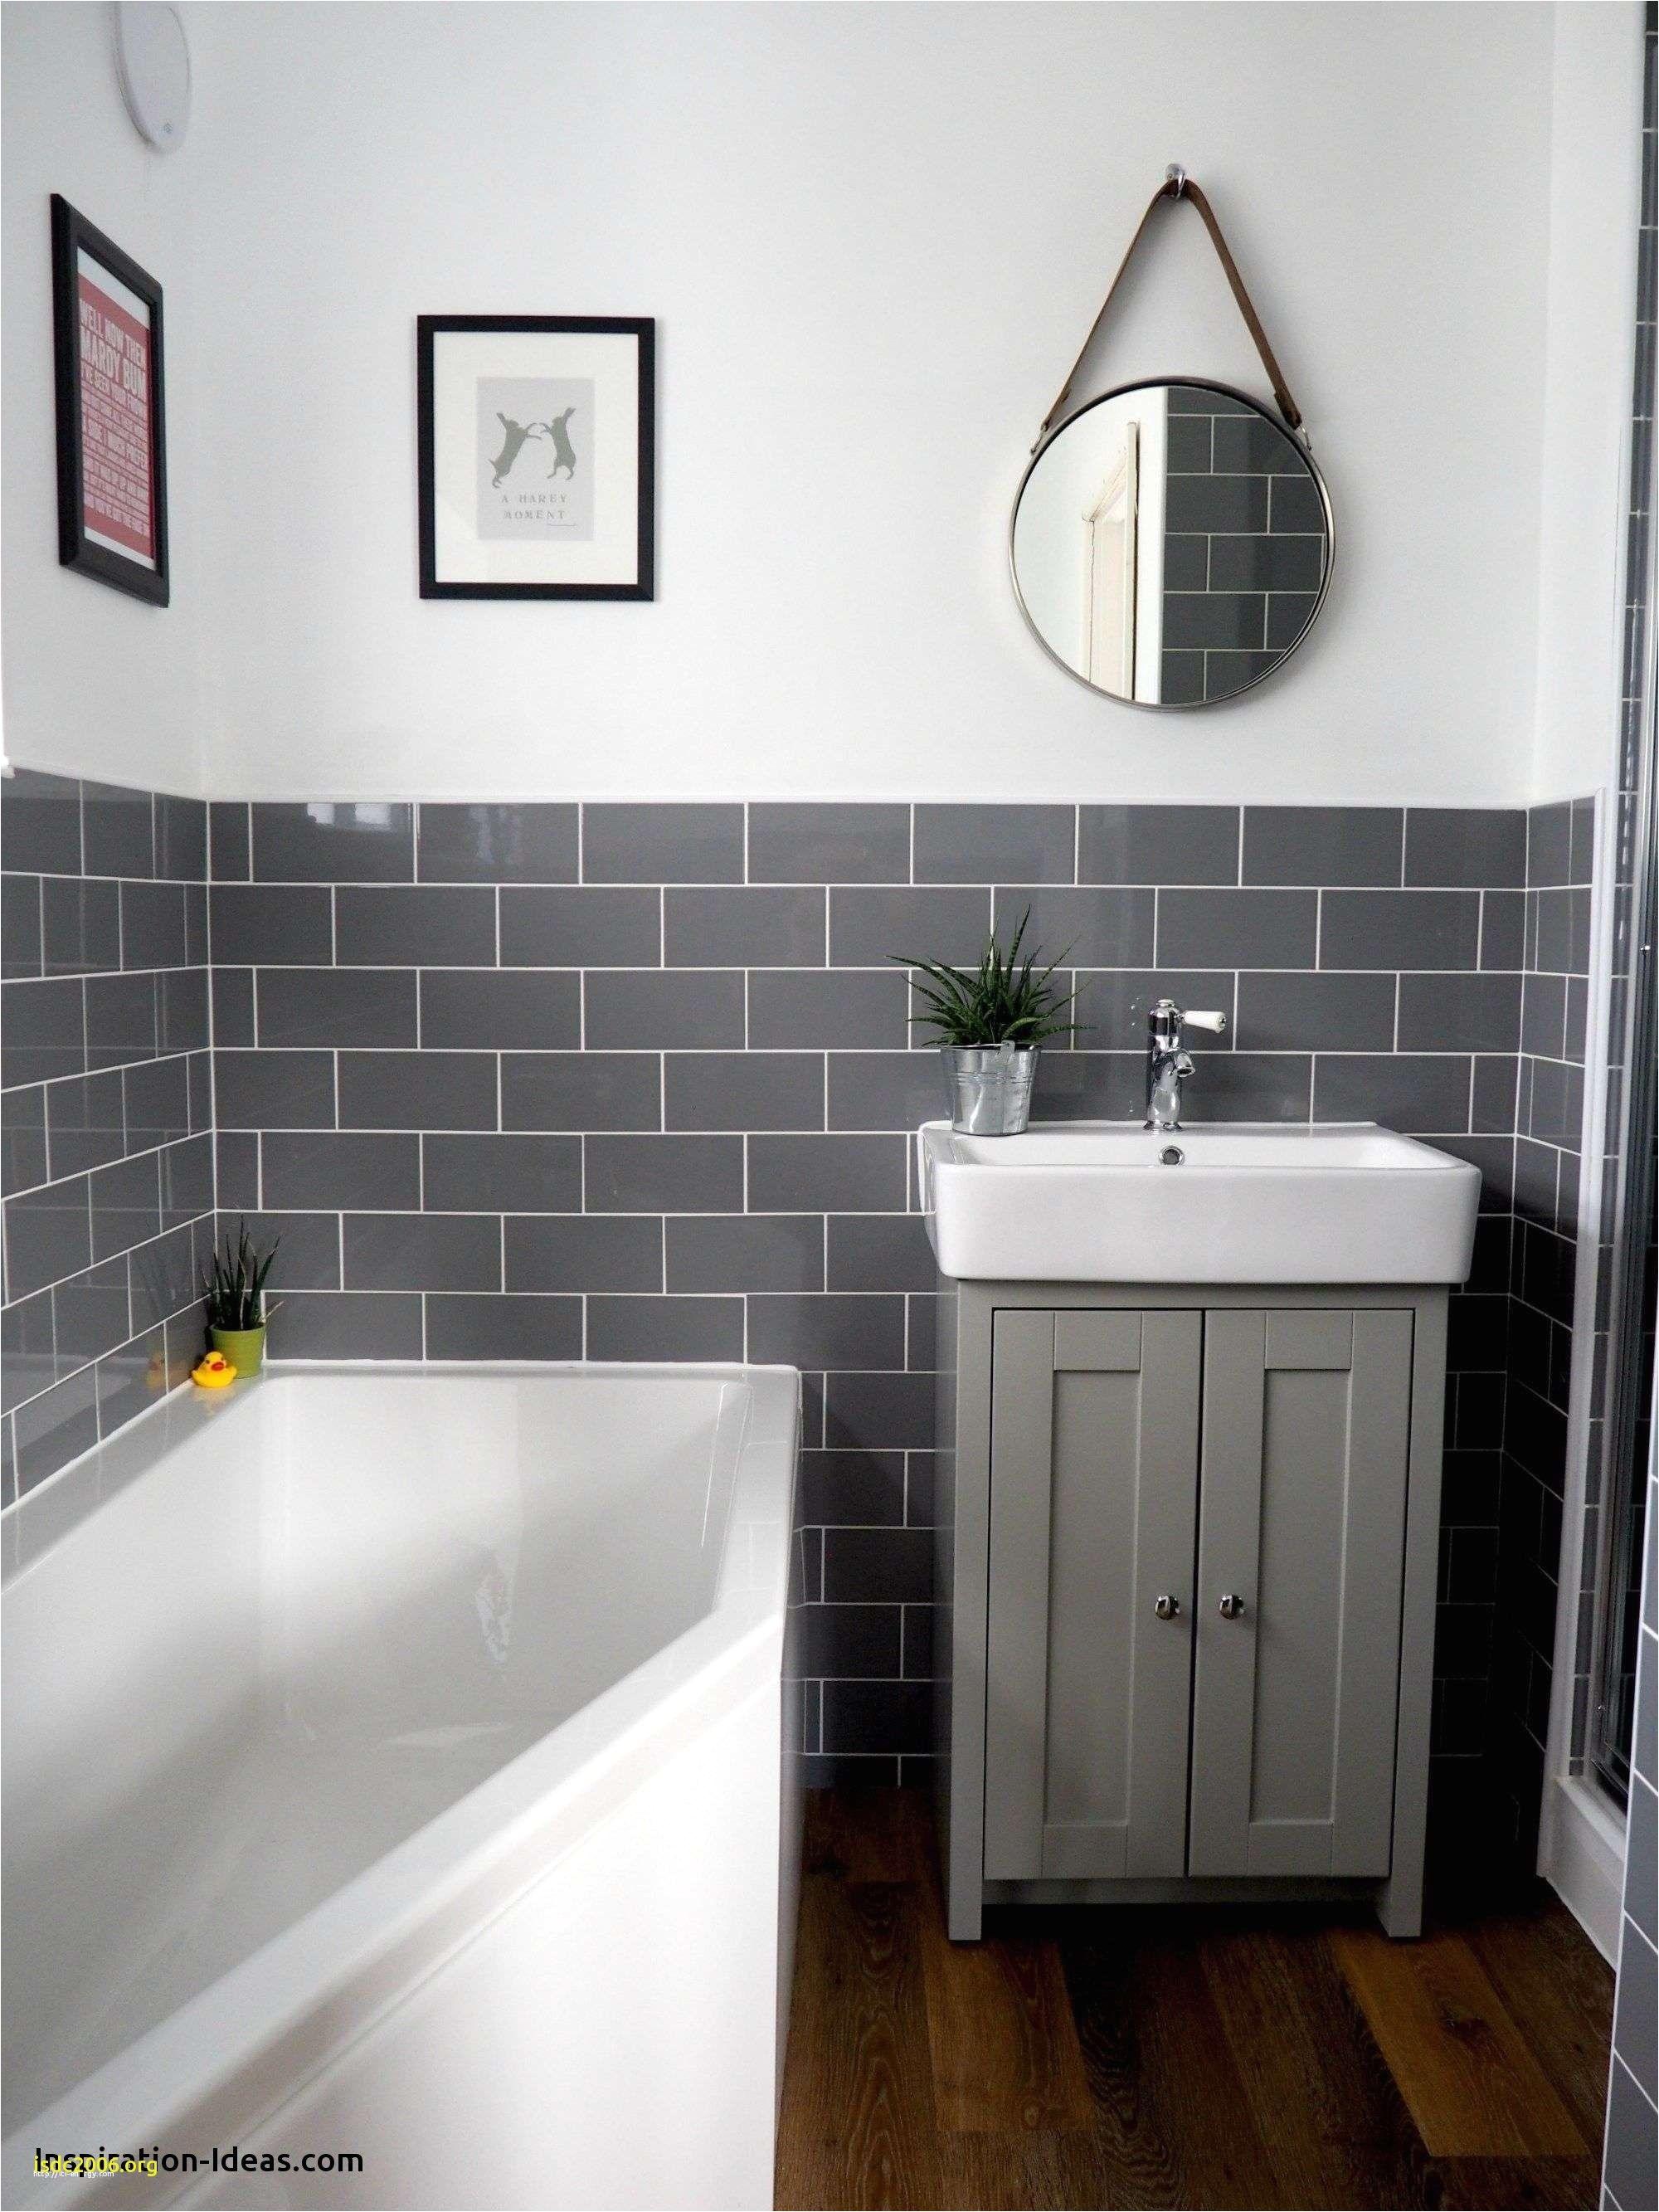 Simple Bathroom Design Ideas New Simple Bathroom Designs for Small Spaces